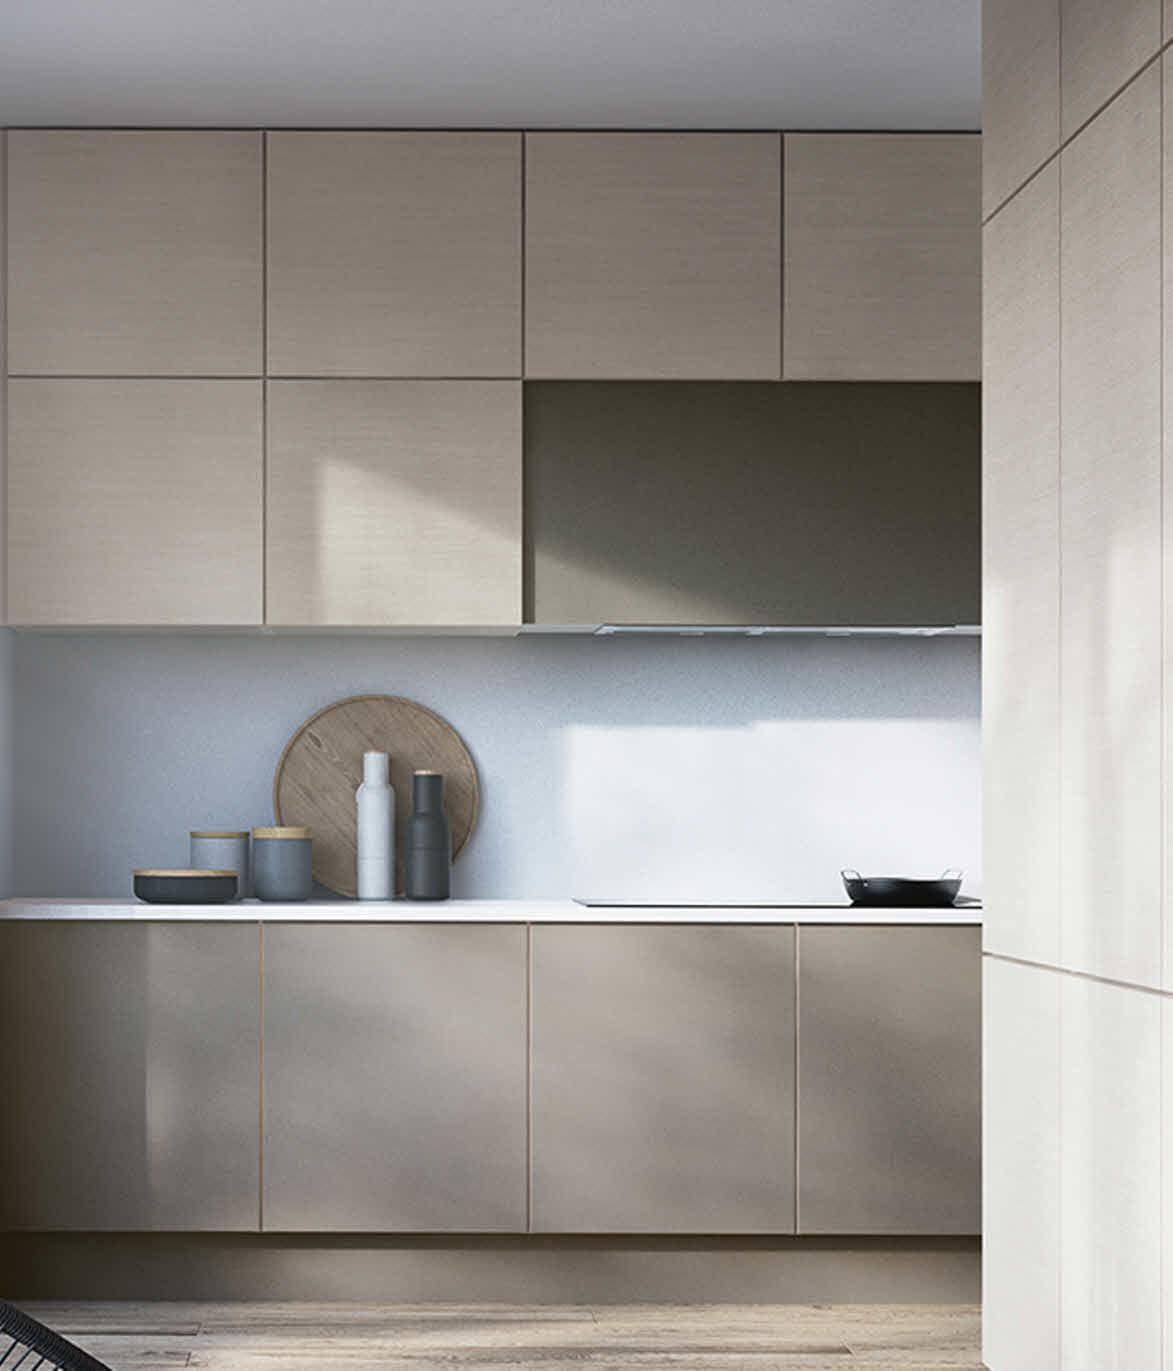 Cucina moderna / in laminato / in frassino / senza maniglie - ATHENA ...